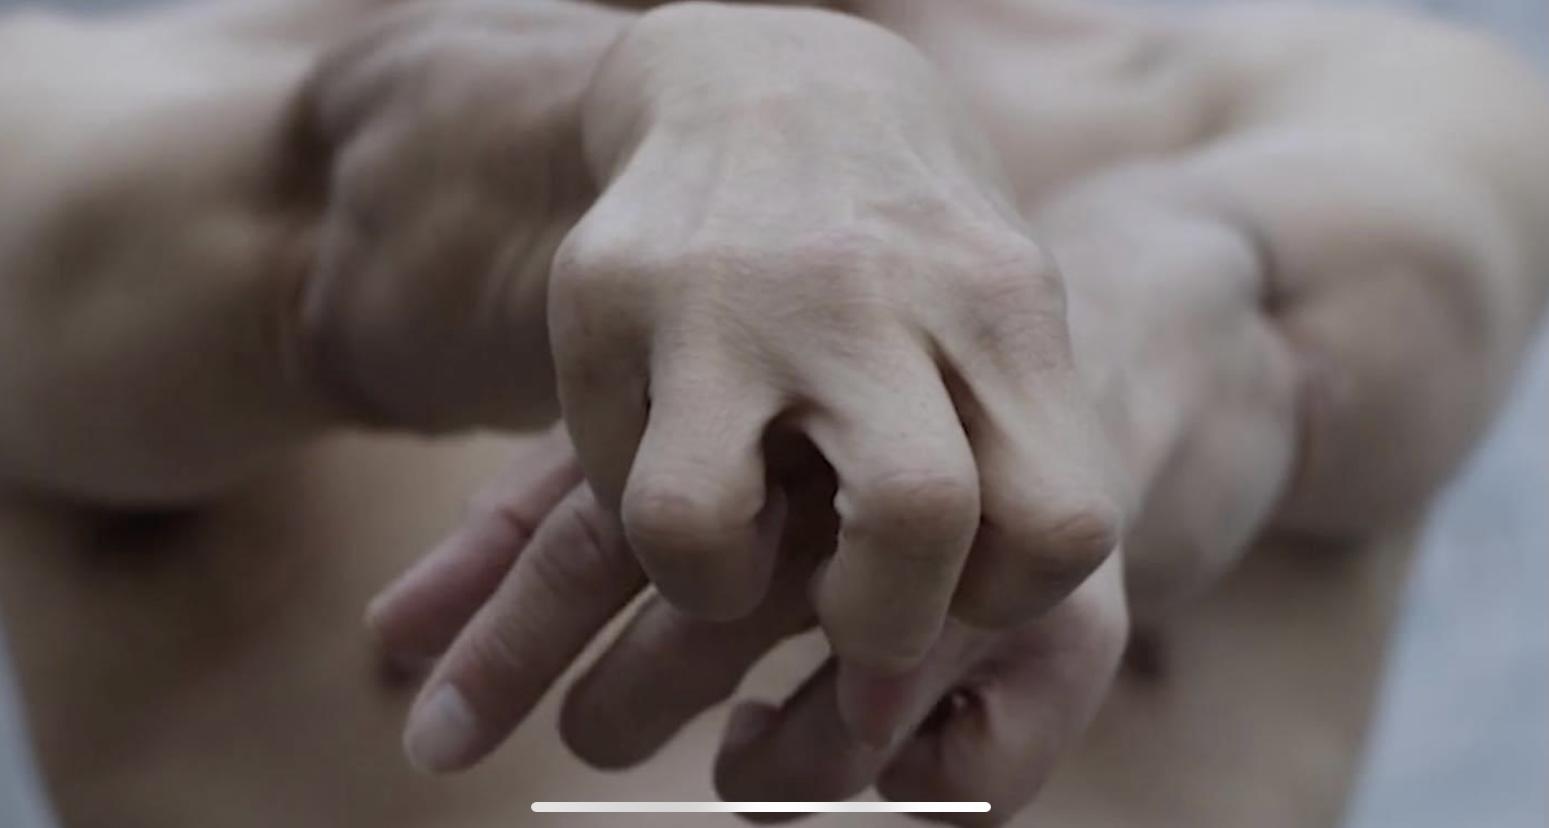 'ST.ARK' (2020), Tony Yap. Video still.